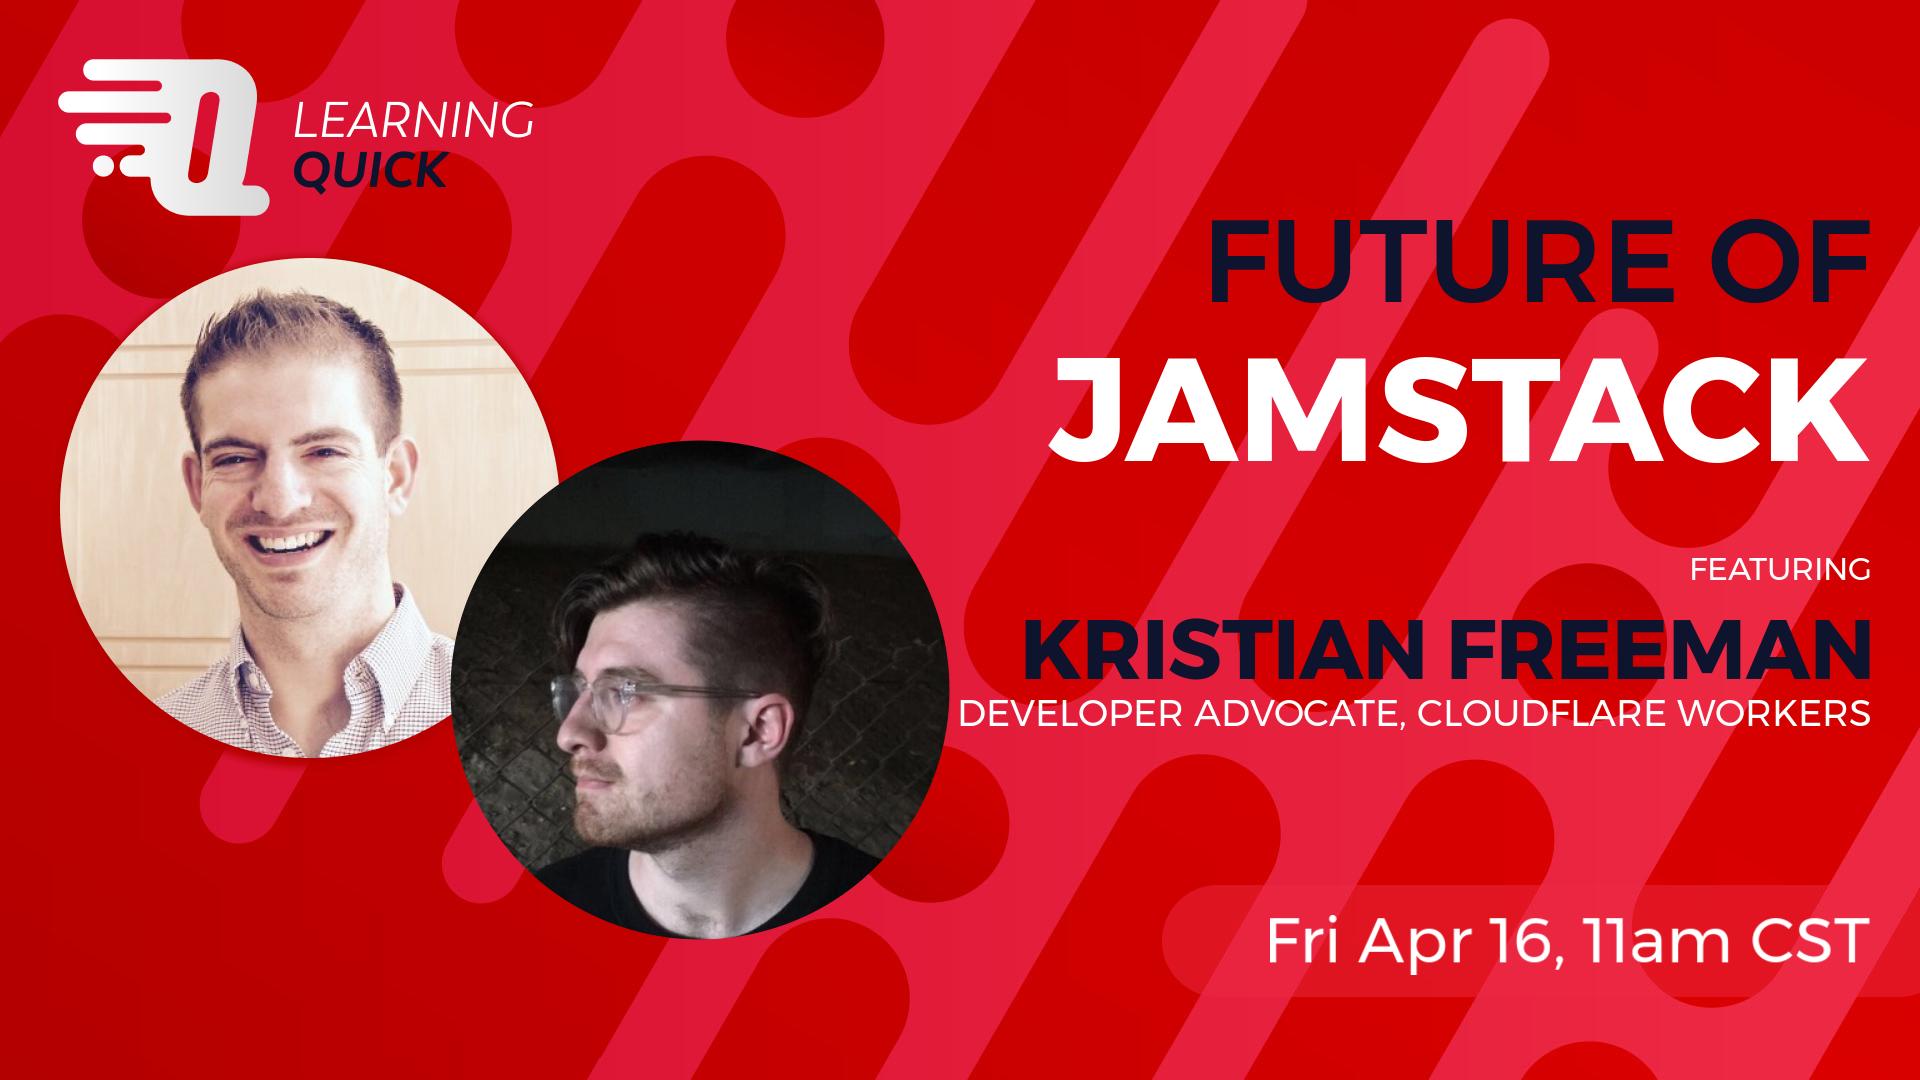 Future of Jamstack with Kristian Freeman